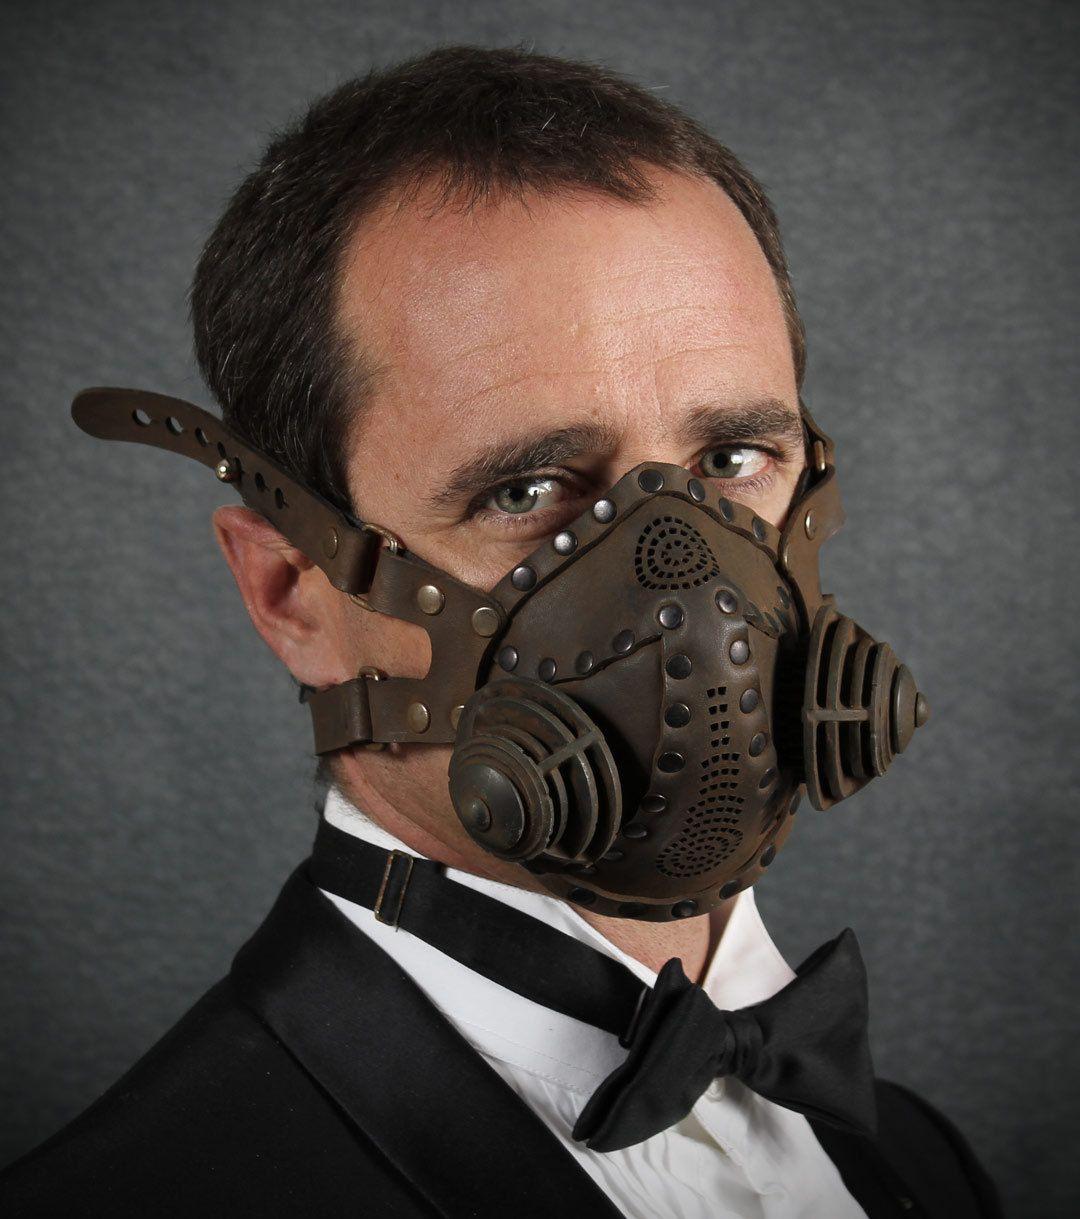 steampunk mask - Szukaj w Google | Masks | Pinterest | Steampunk ...